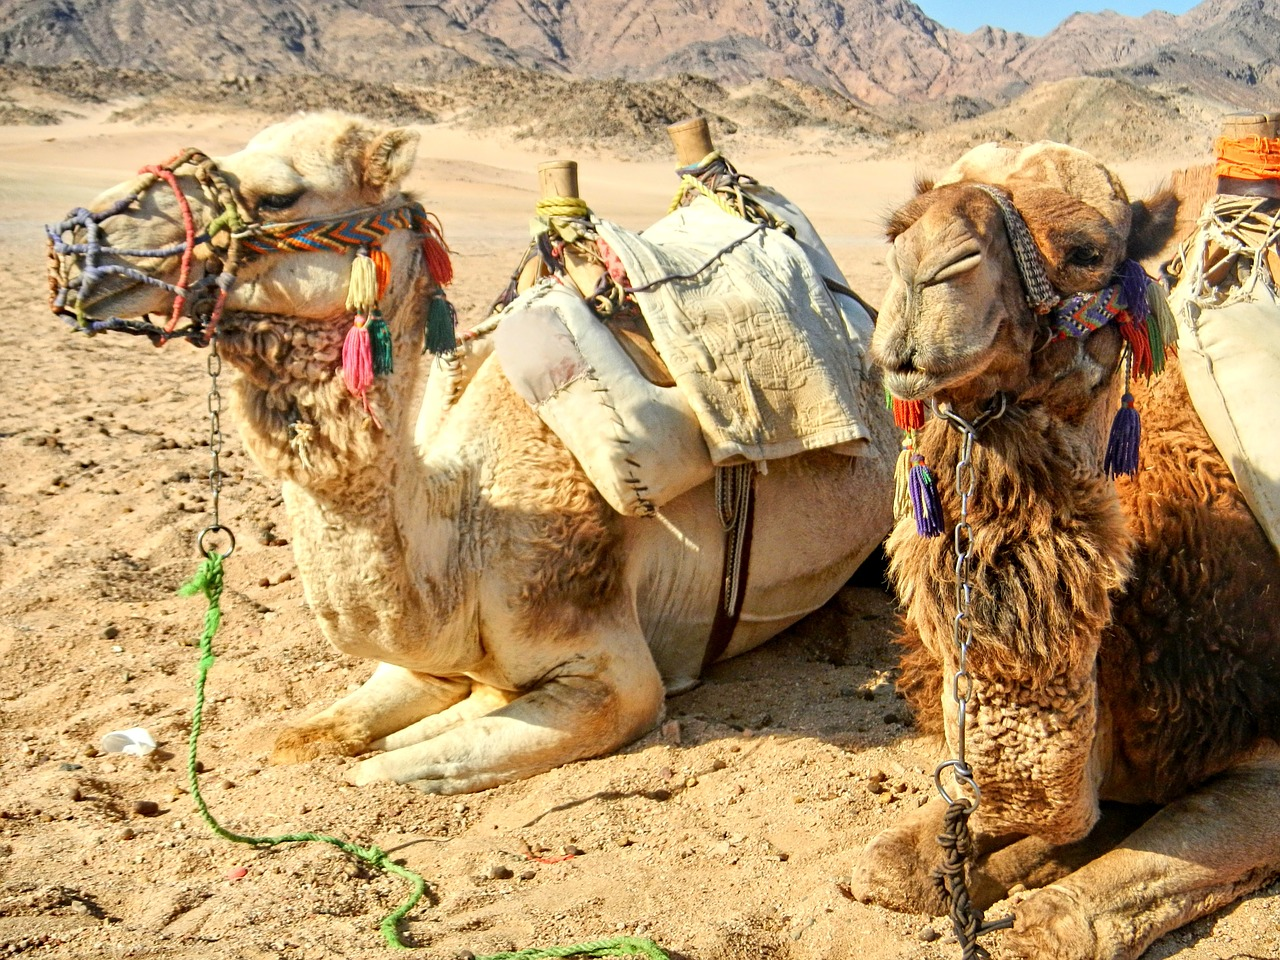 Kamele haben Pause